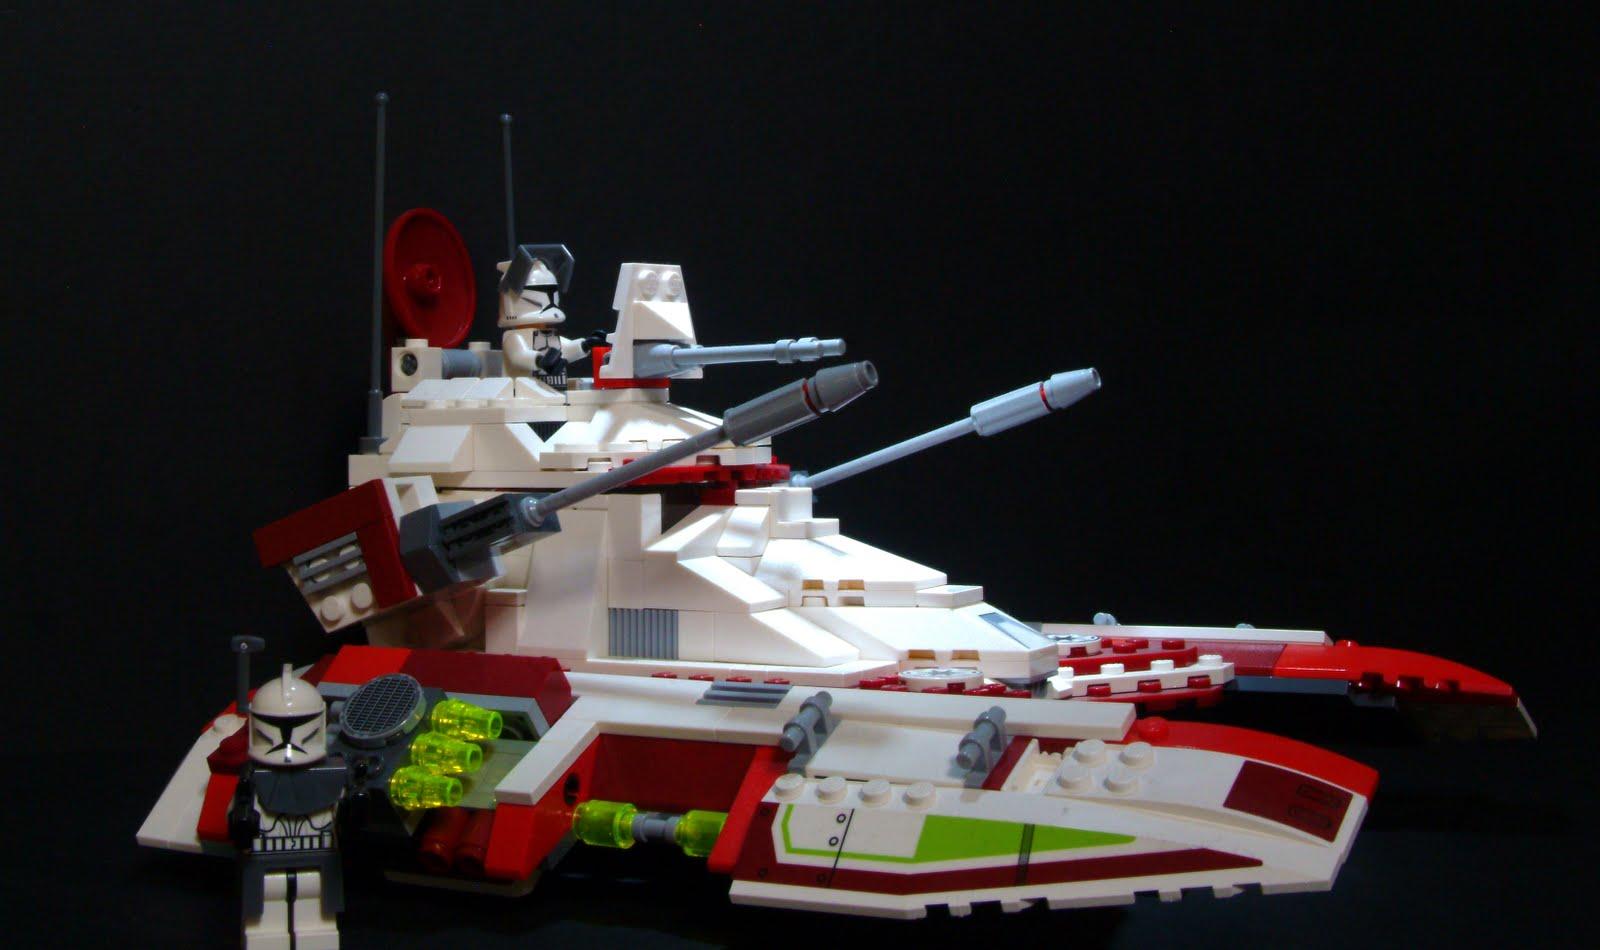 Kisho meteora star wars collector lego star wars models - Bd lego star wars ...